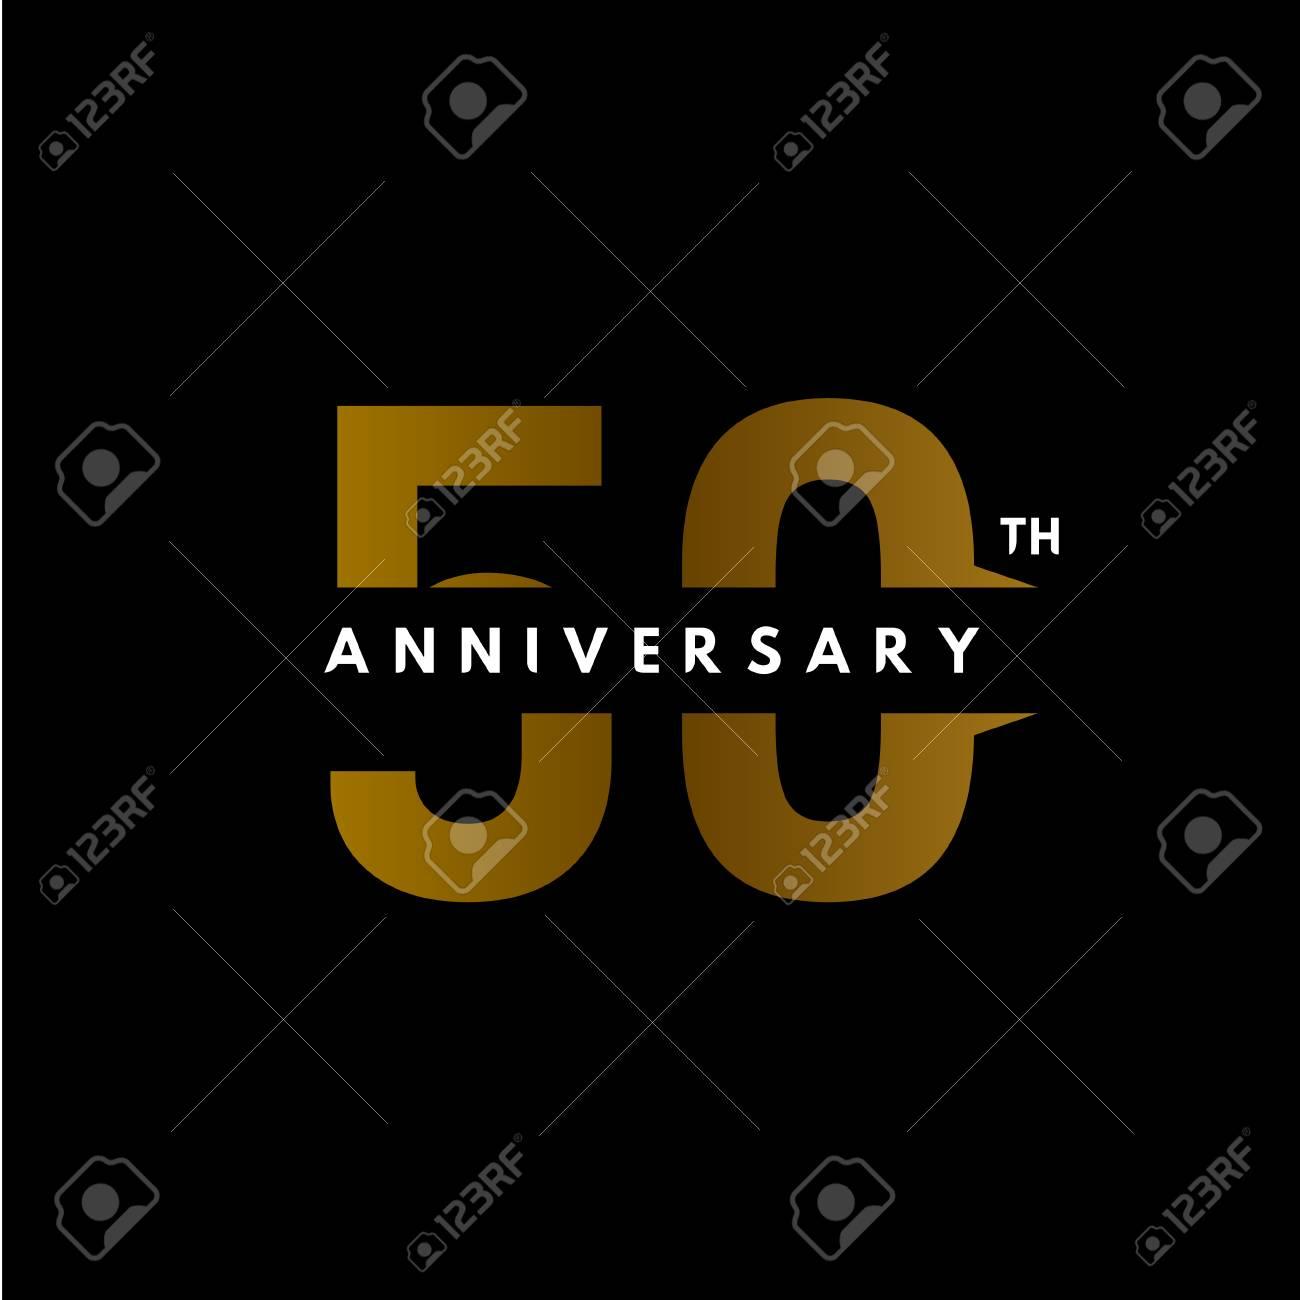 50 Year Anniversary Vector Template Design Illustration - 119205673